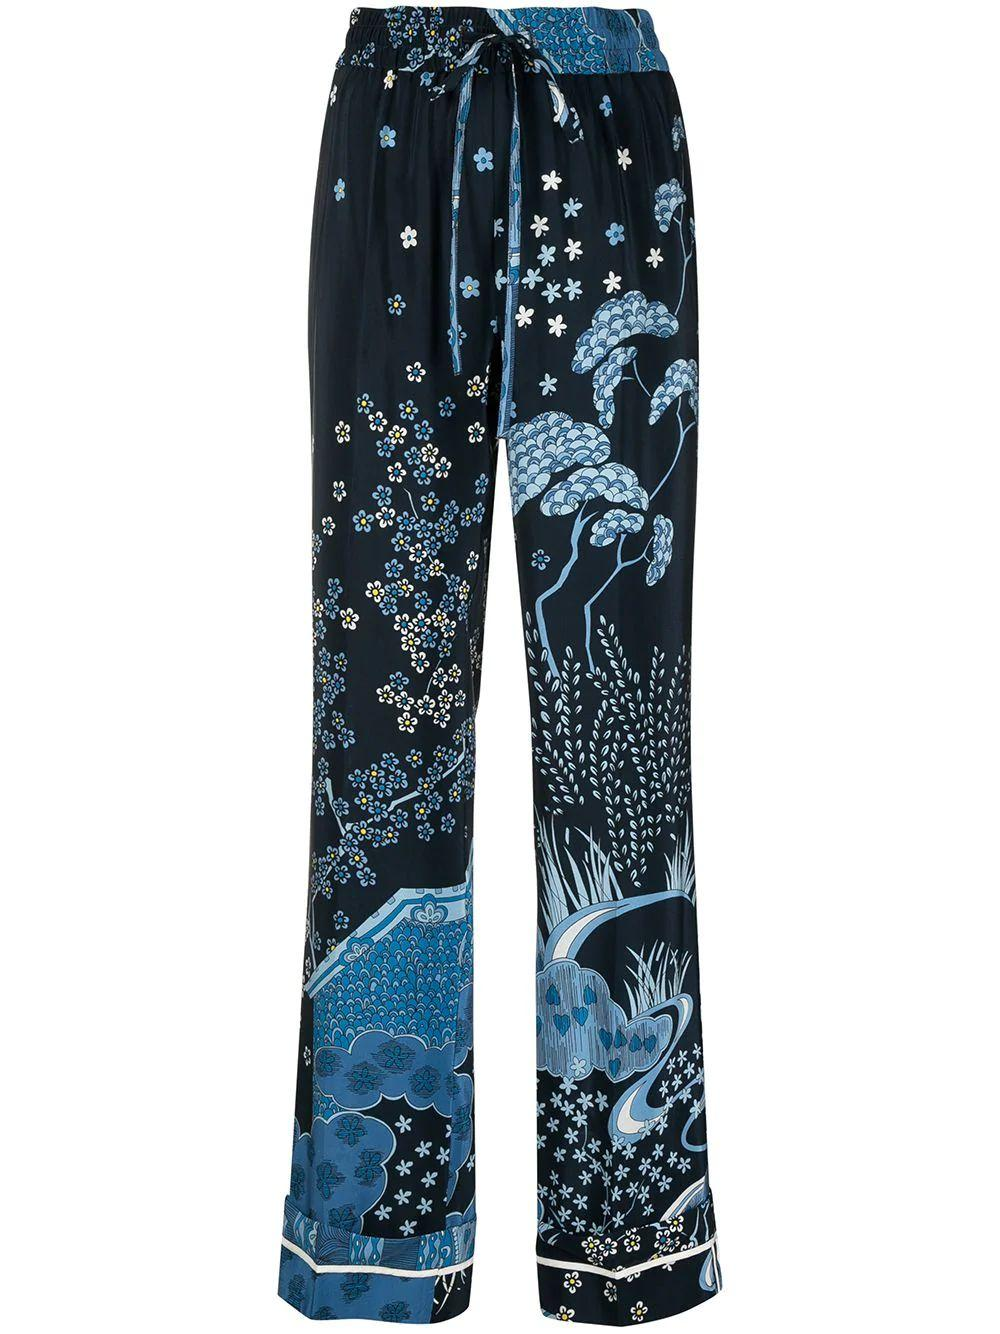 Floral Printed Straight Leg Pant